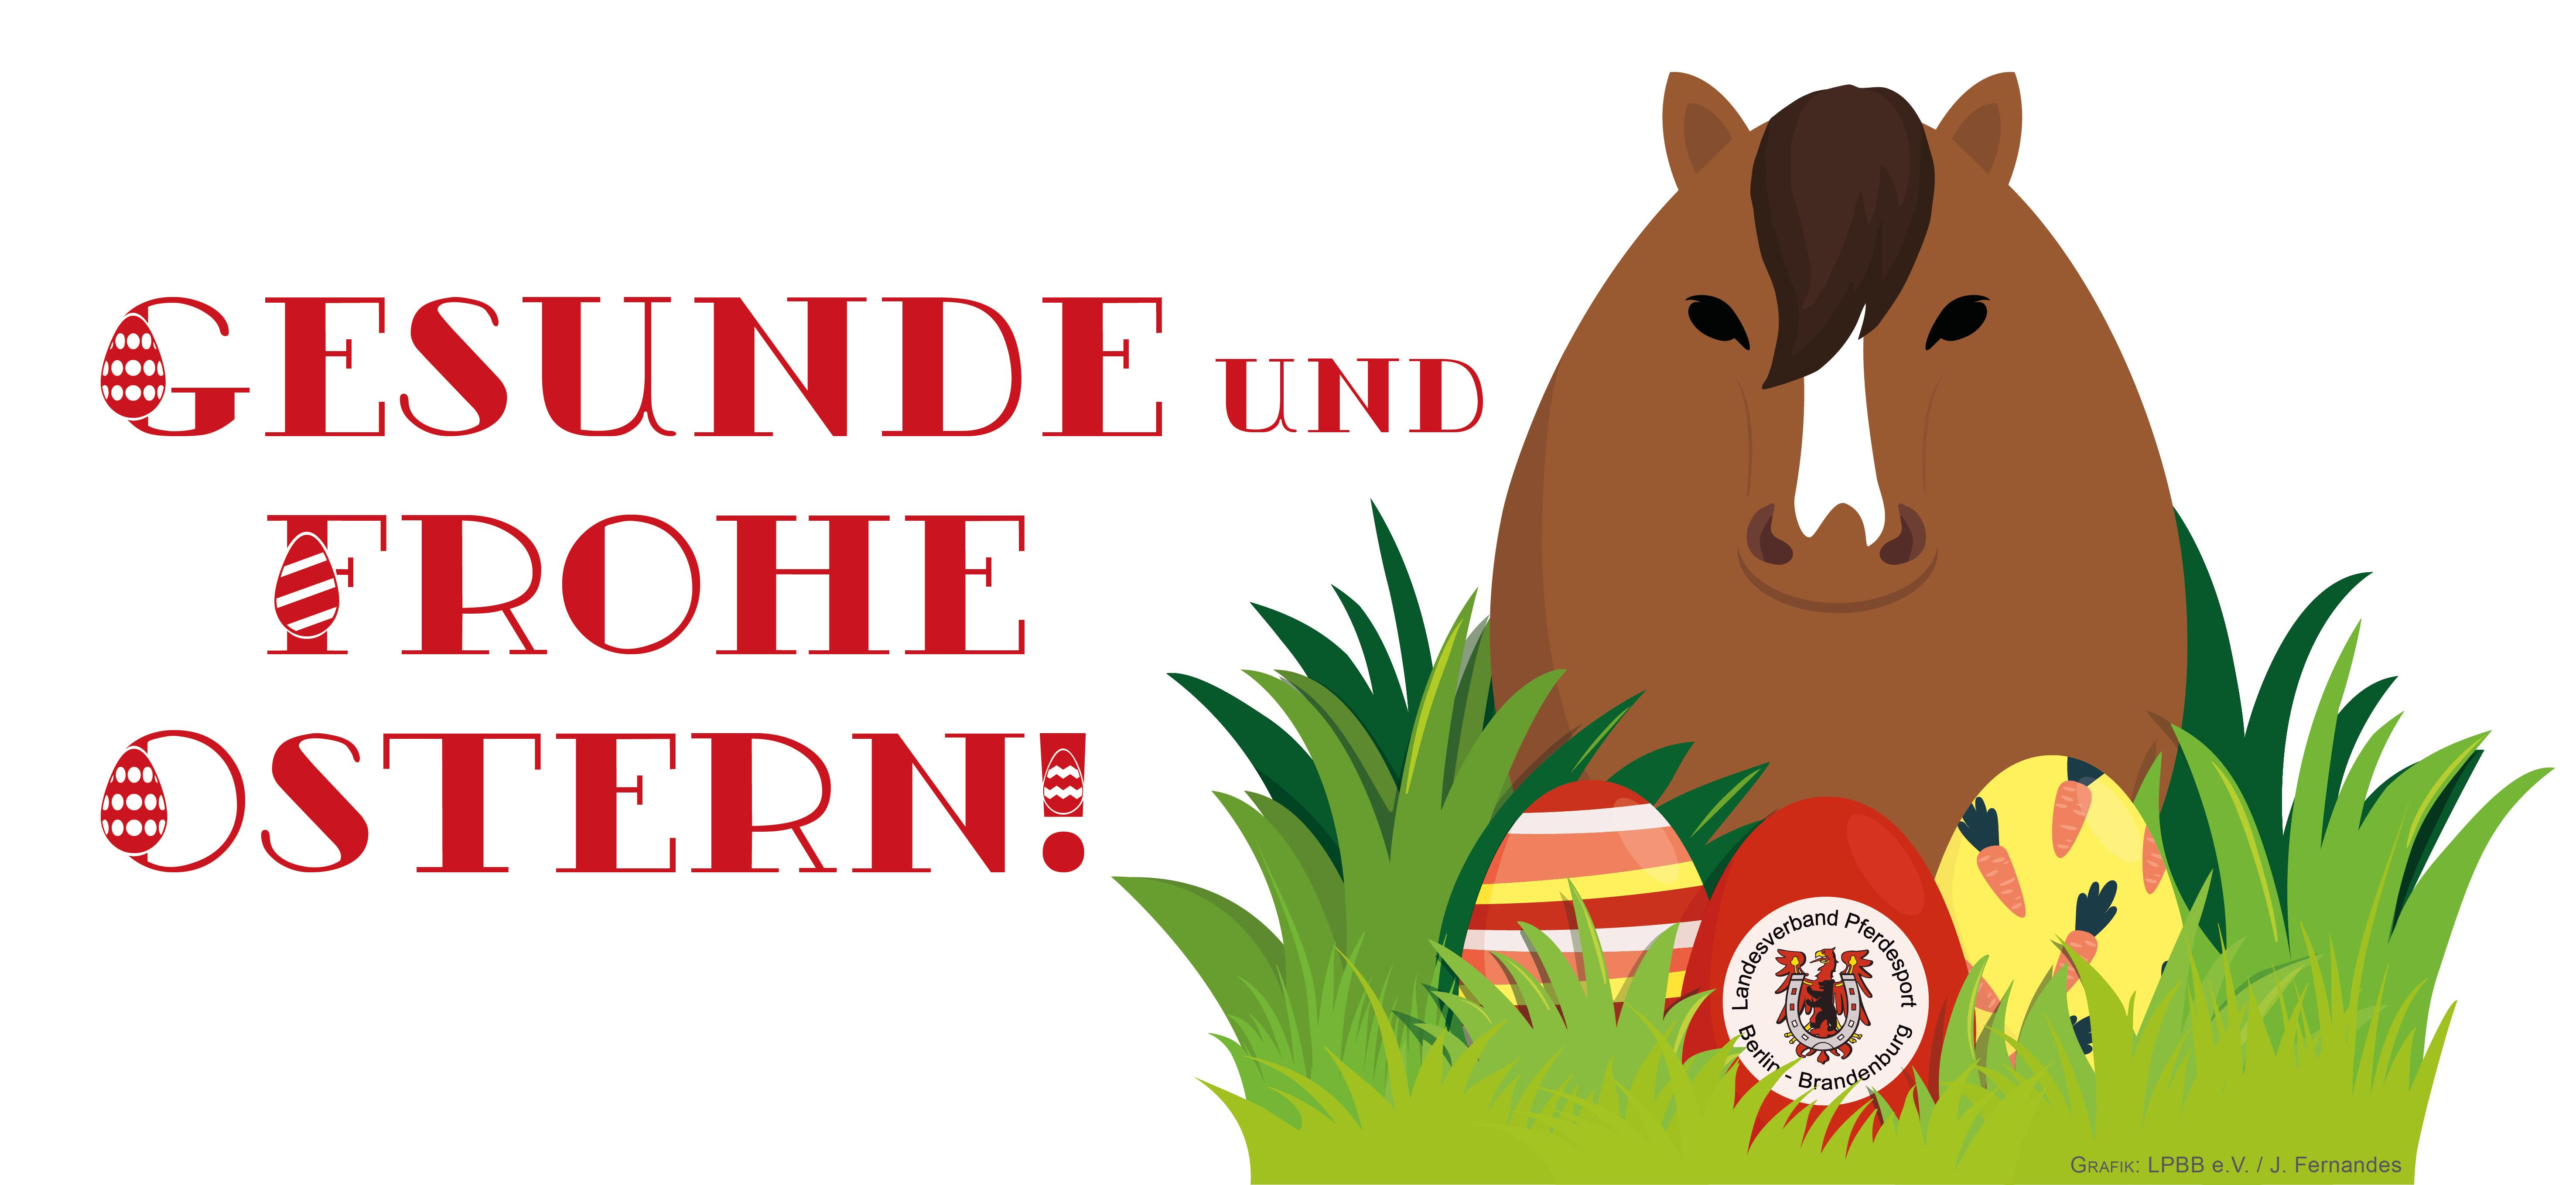 Nachrichtenarchiv Landesverband Pferdesport Berlin Brandenburg E V